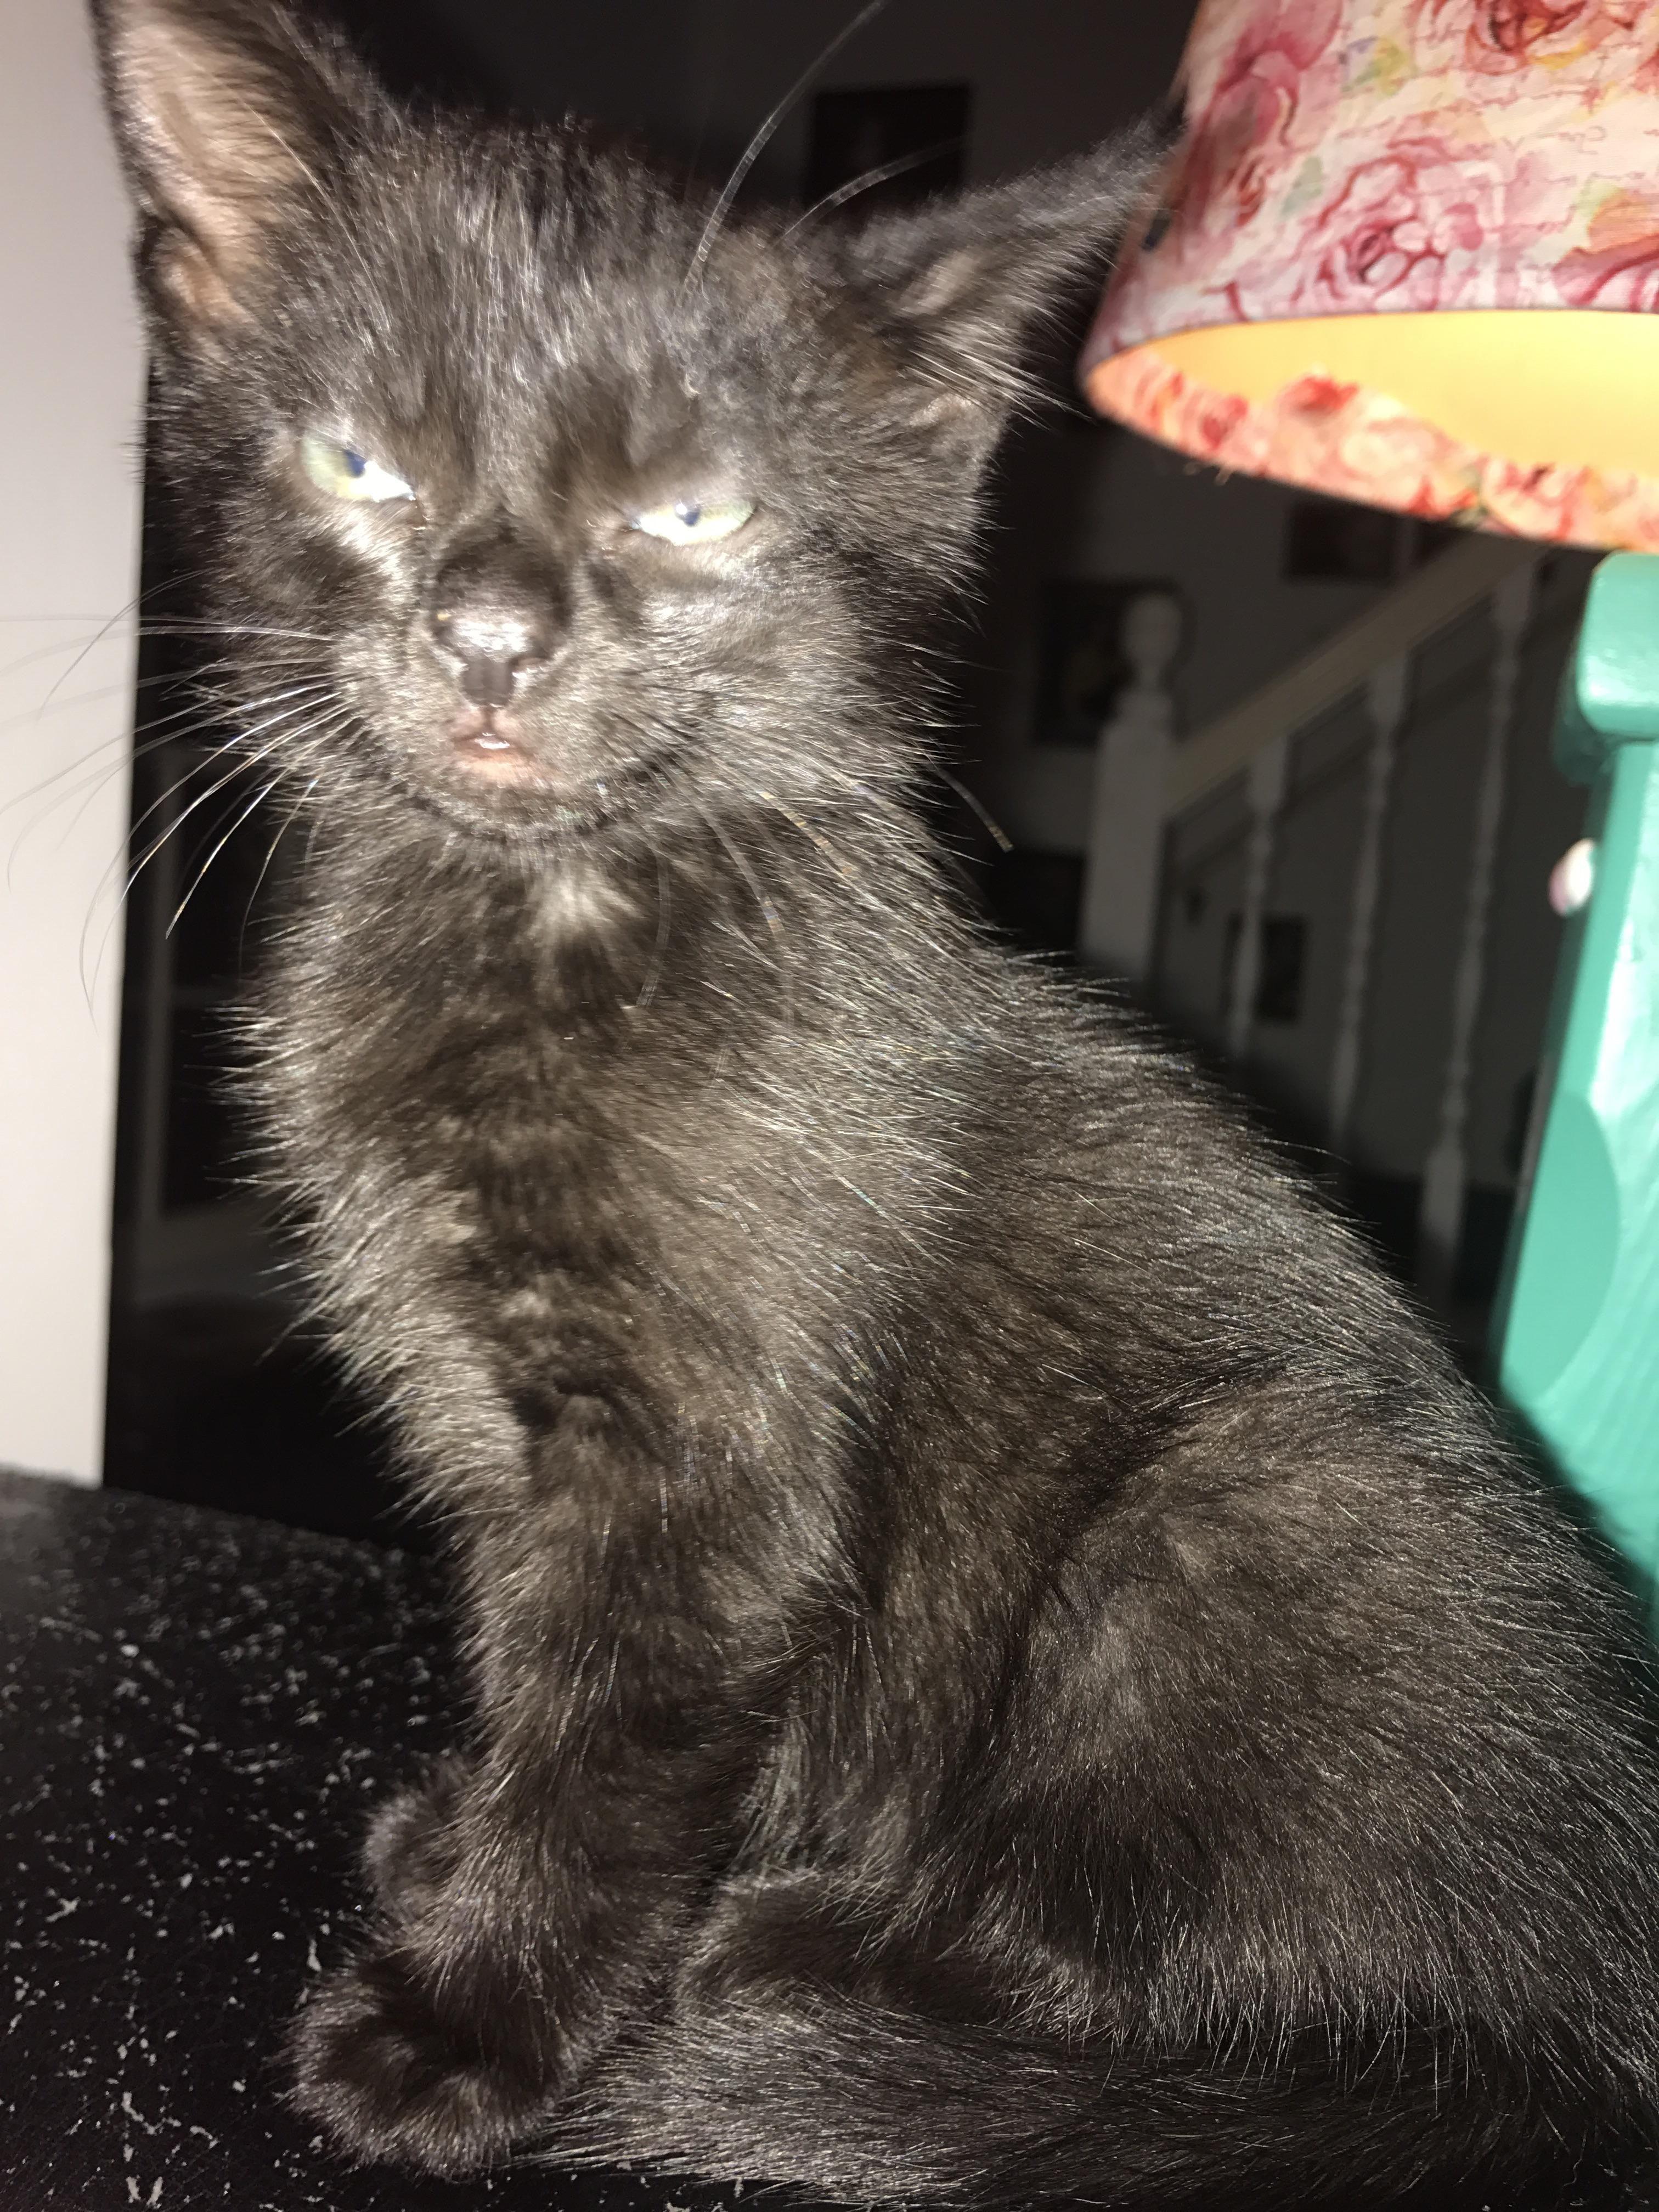 Accidental flash on kitty not impressed. http://ift.tt/2rsfUJI